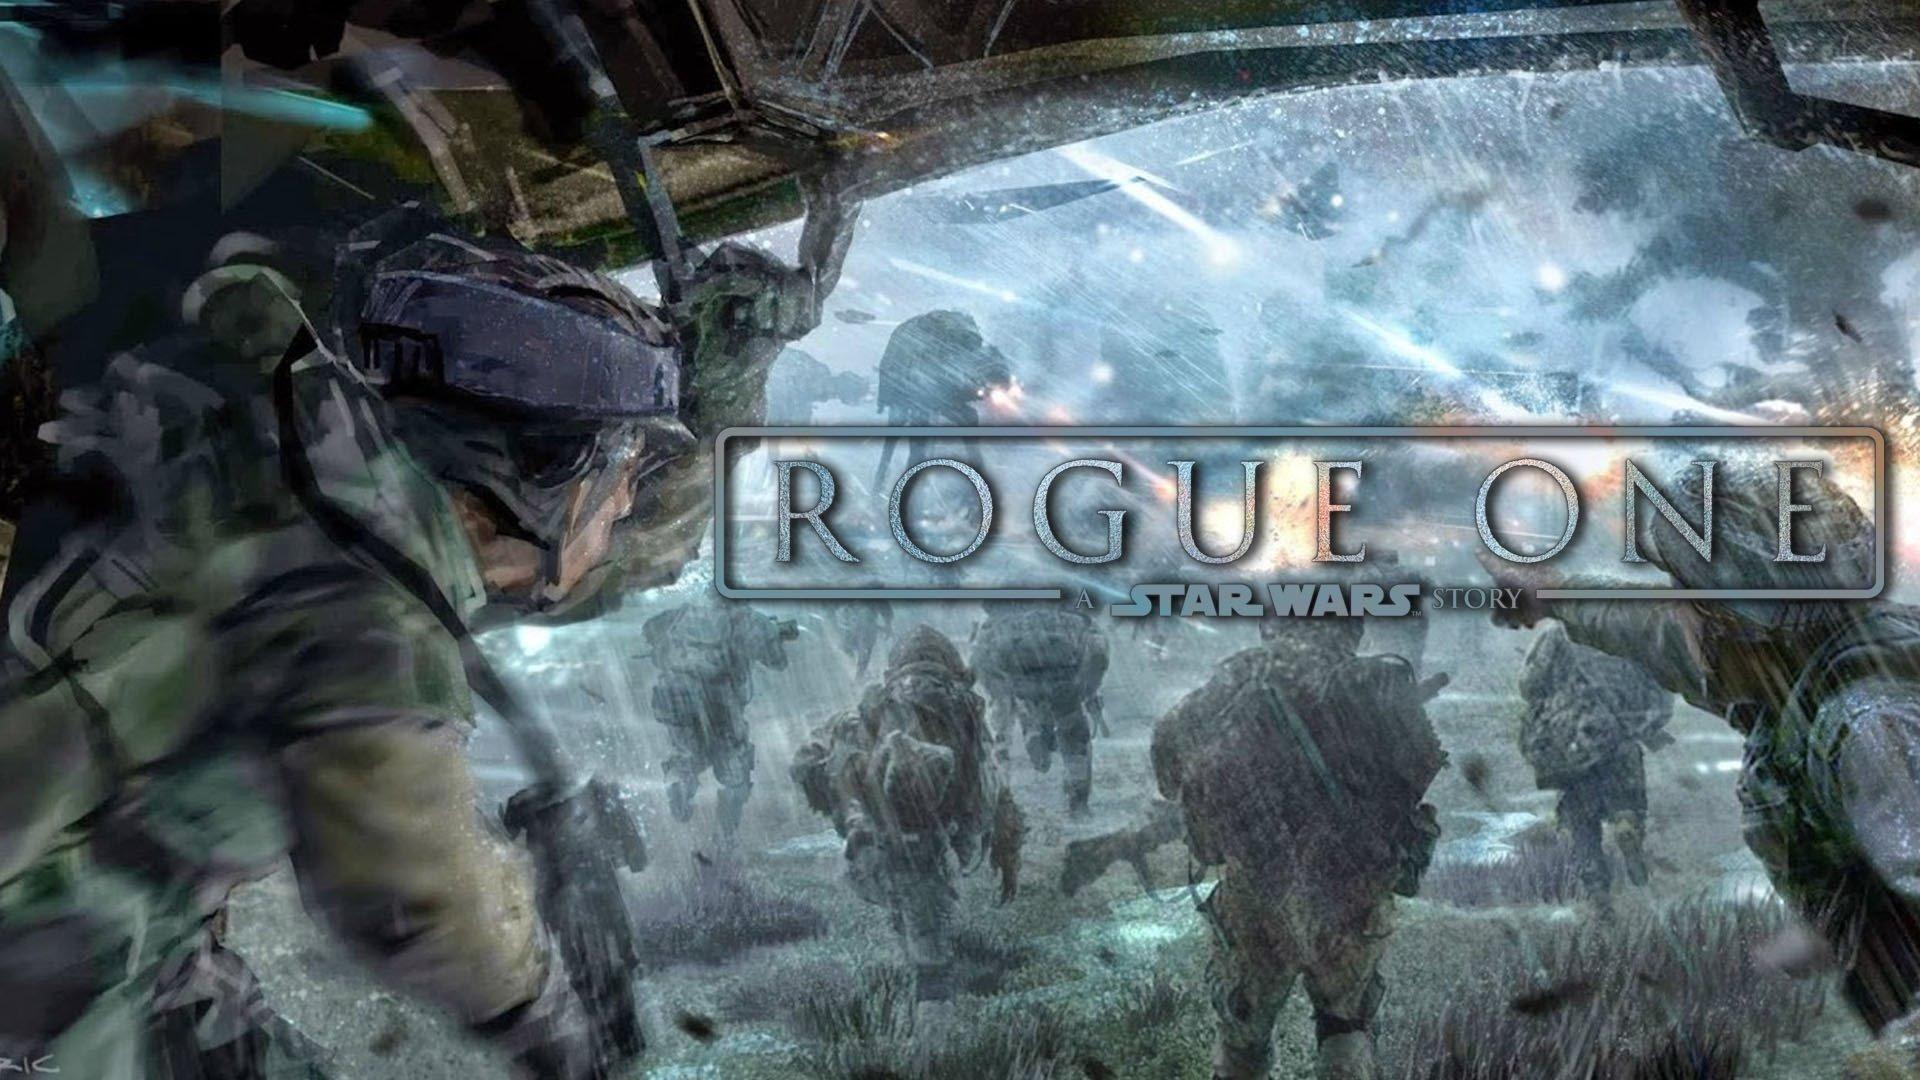 rogue_one_star_wars_story_disney_futuristic_sci_fi_opera_sction_fighting_poster_1920x1080